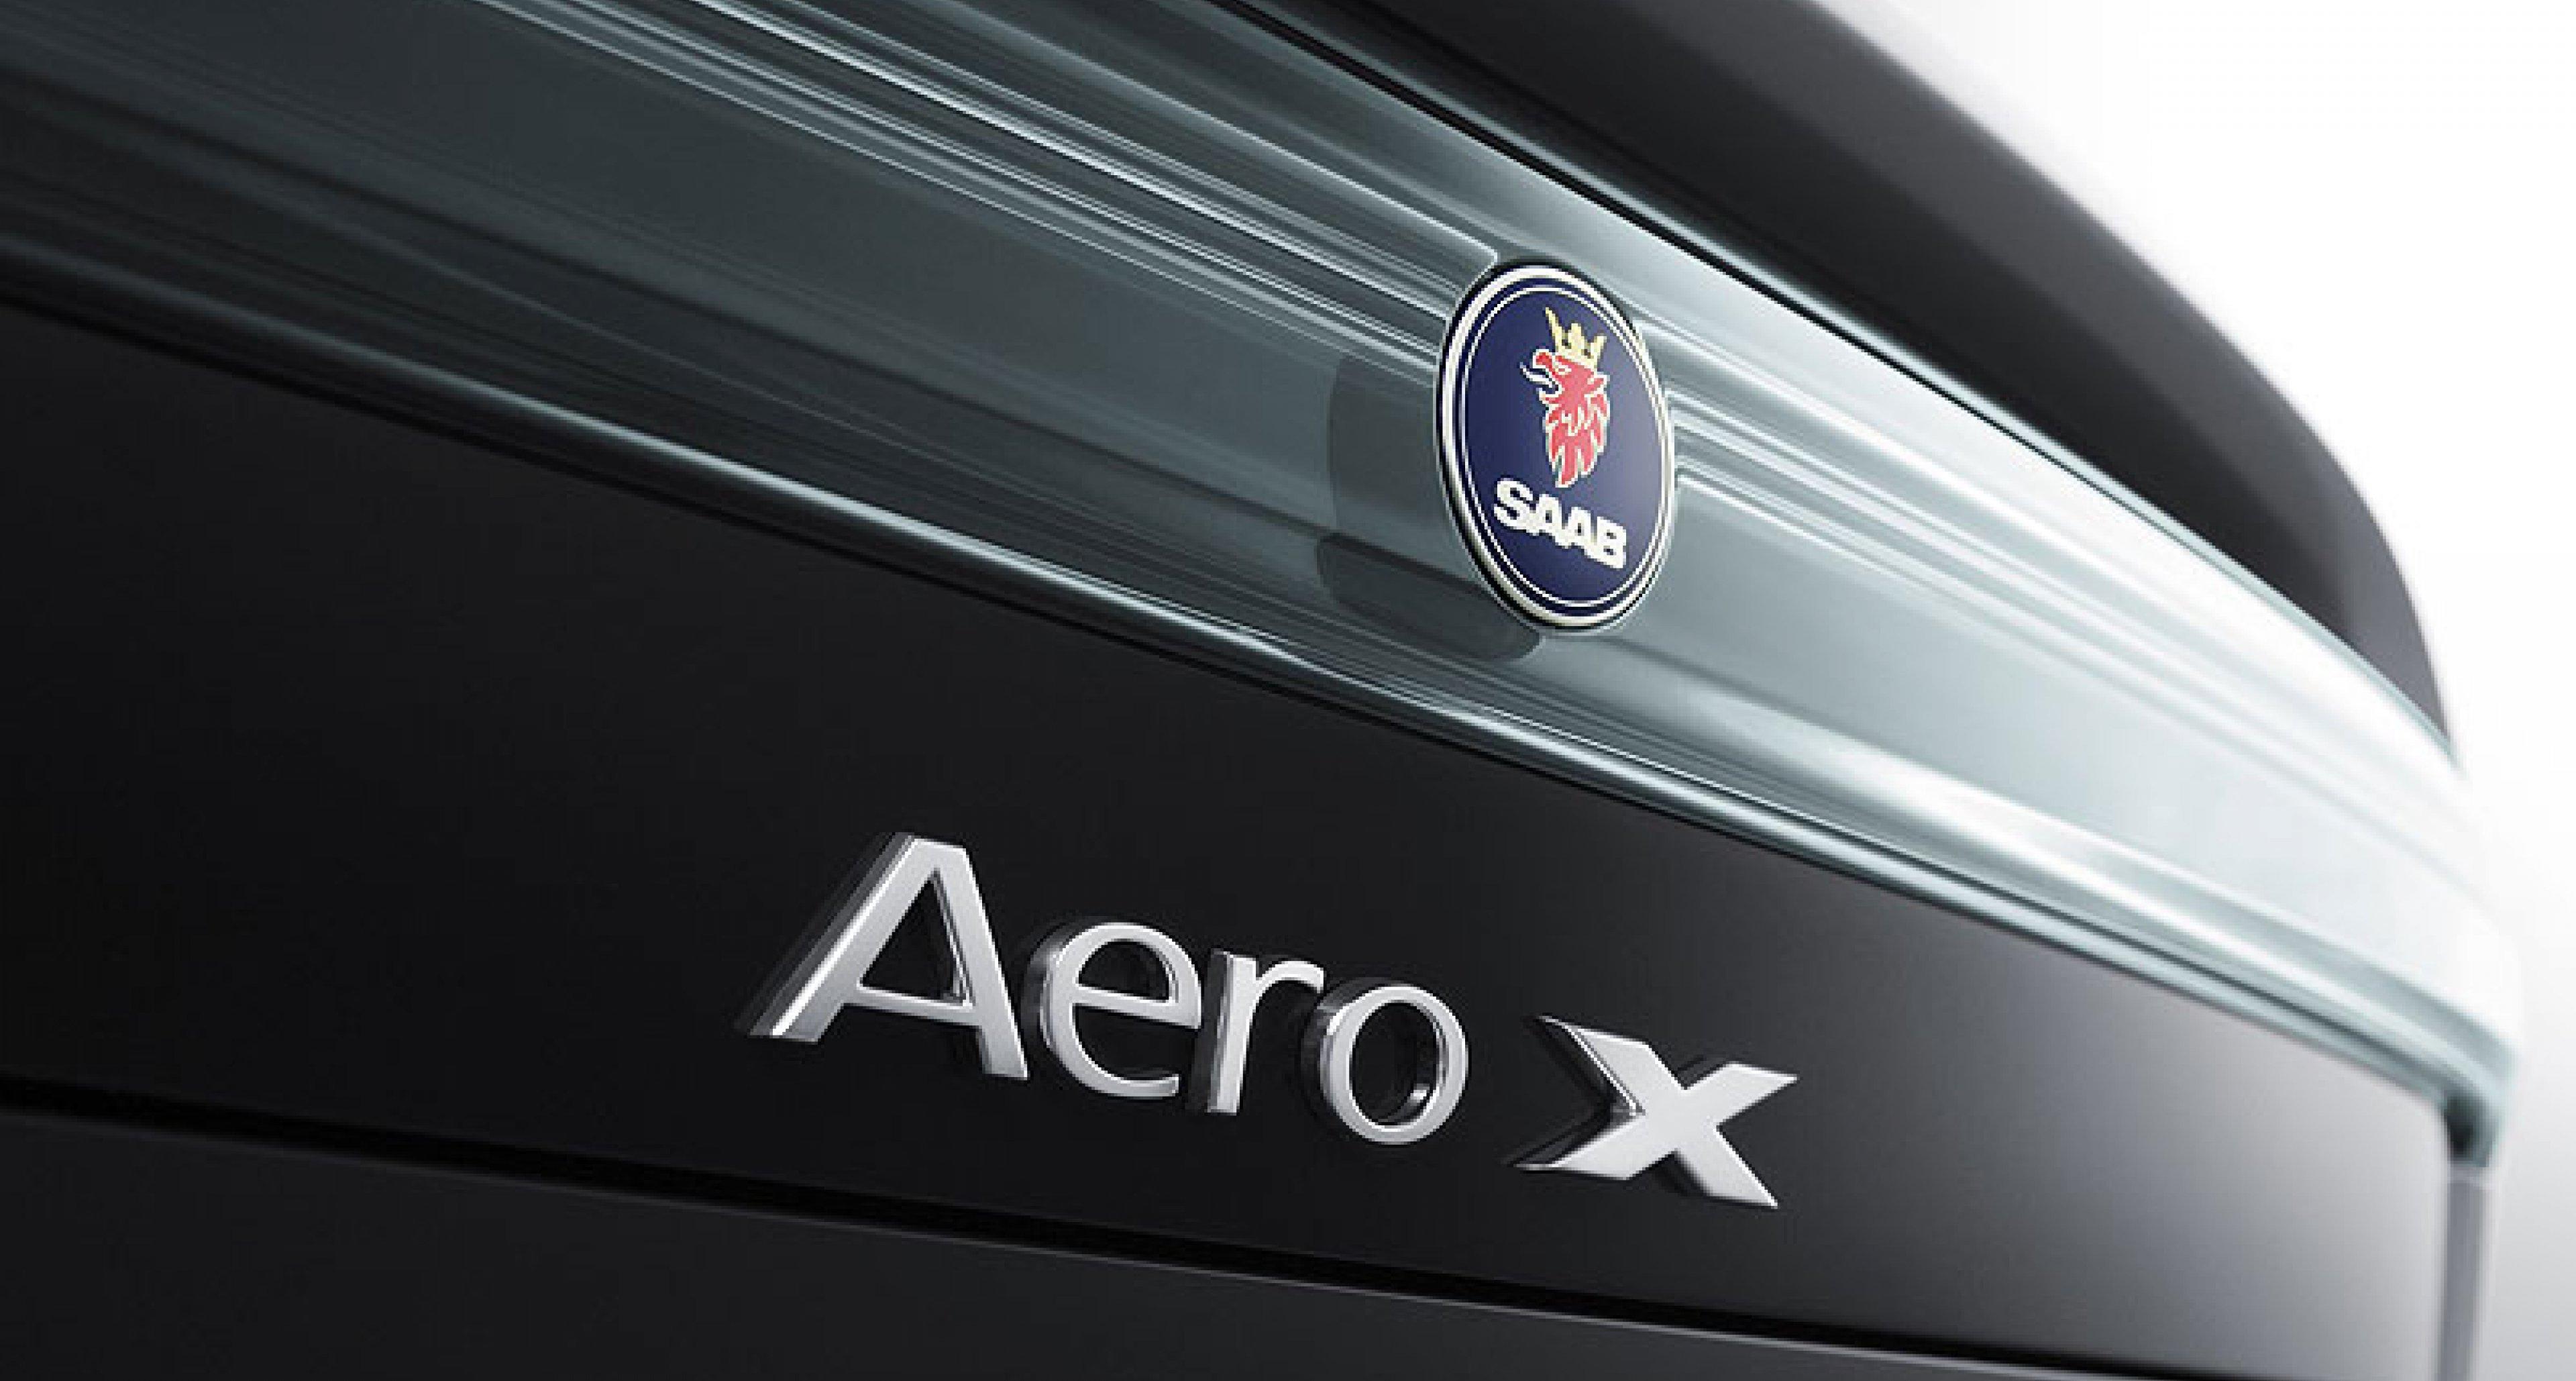 Saab Aero X – Street (Jet) Fighter